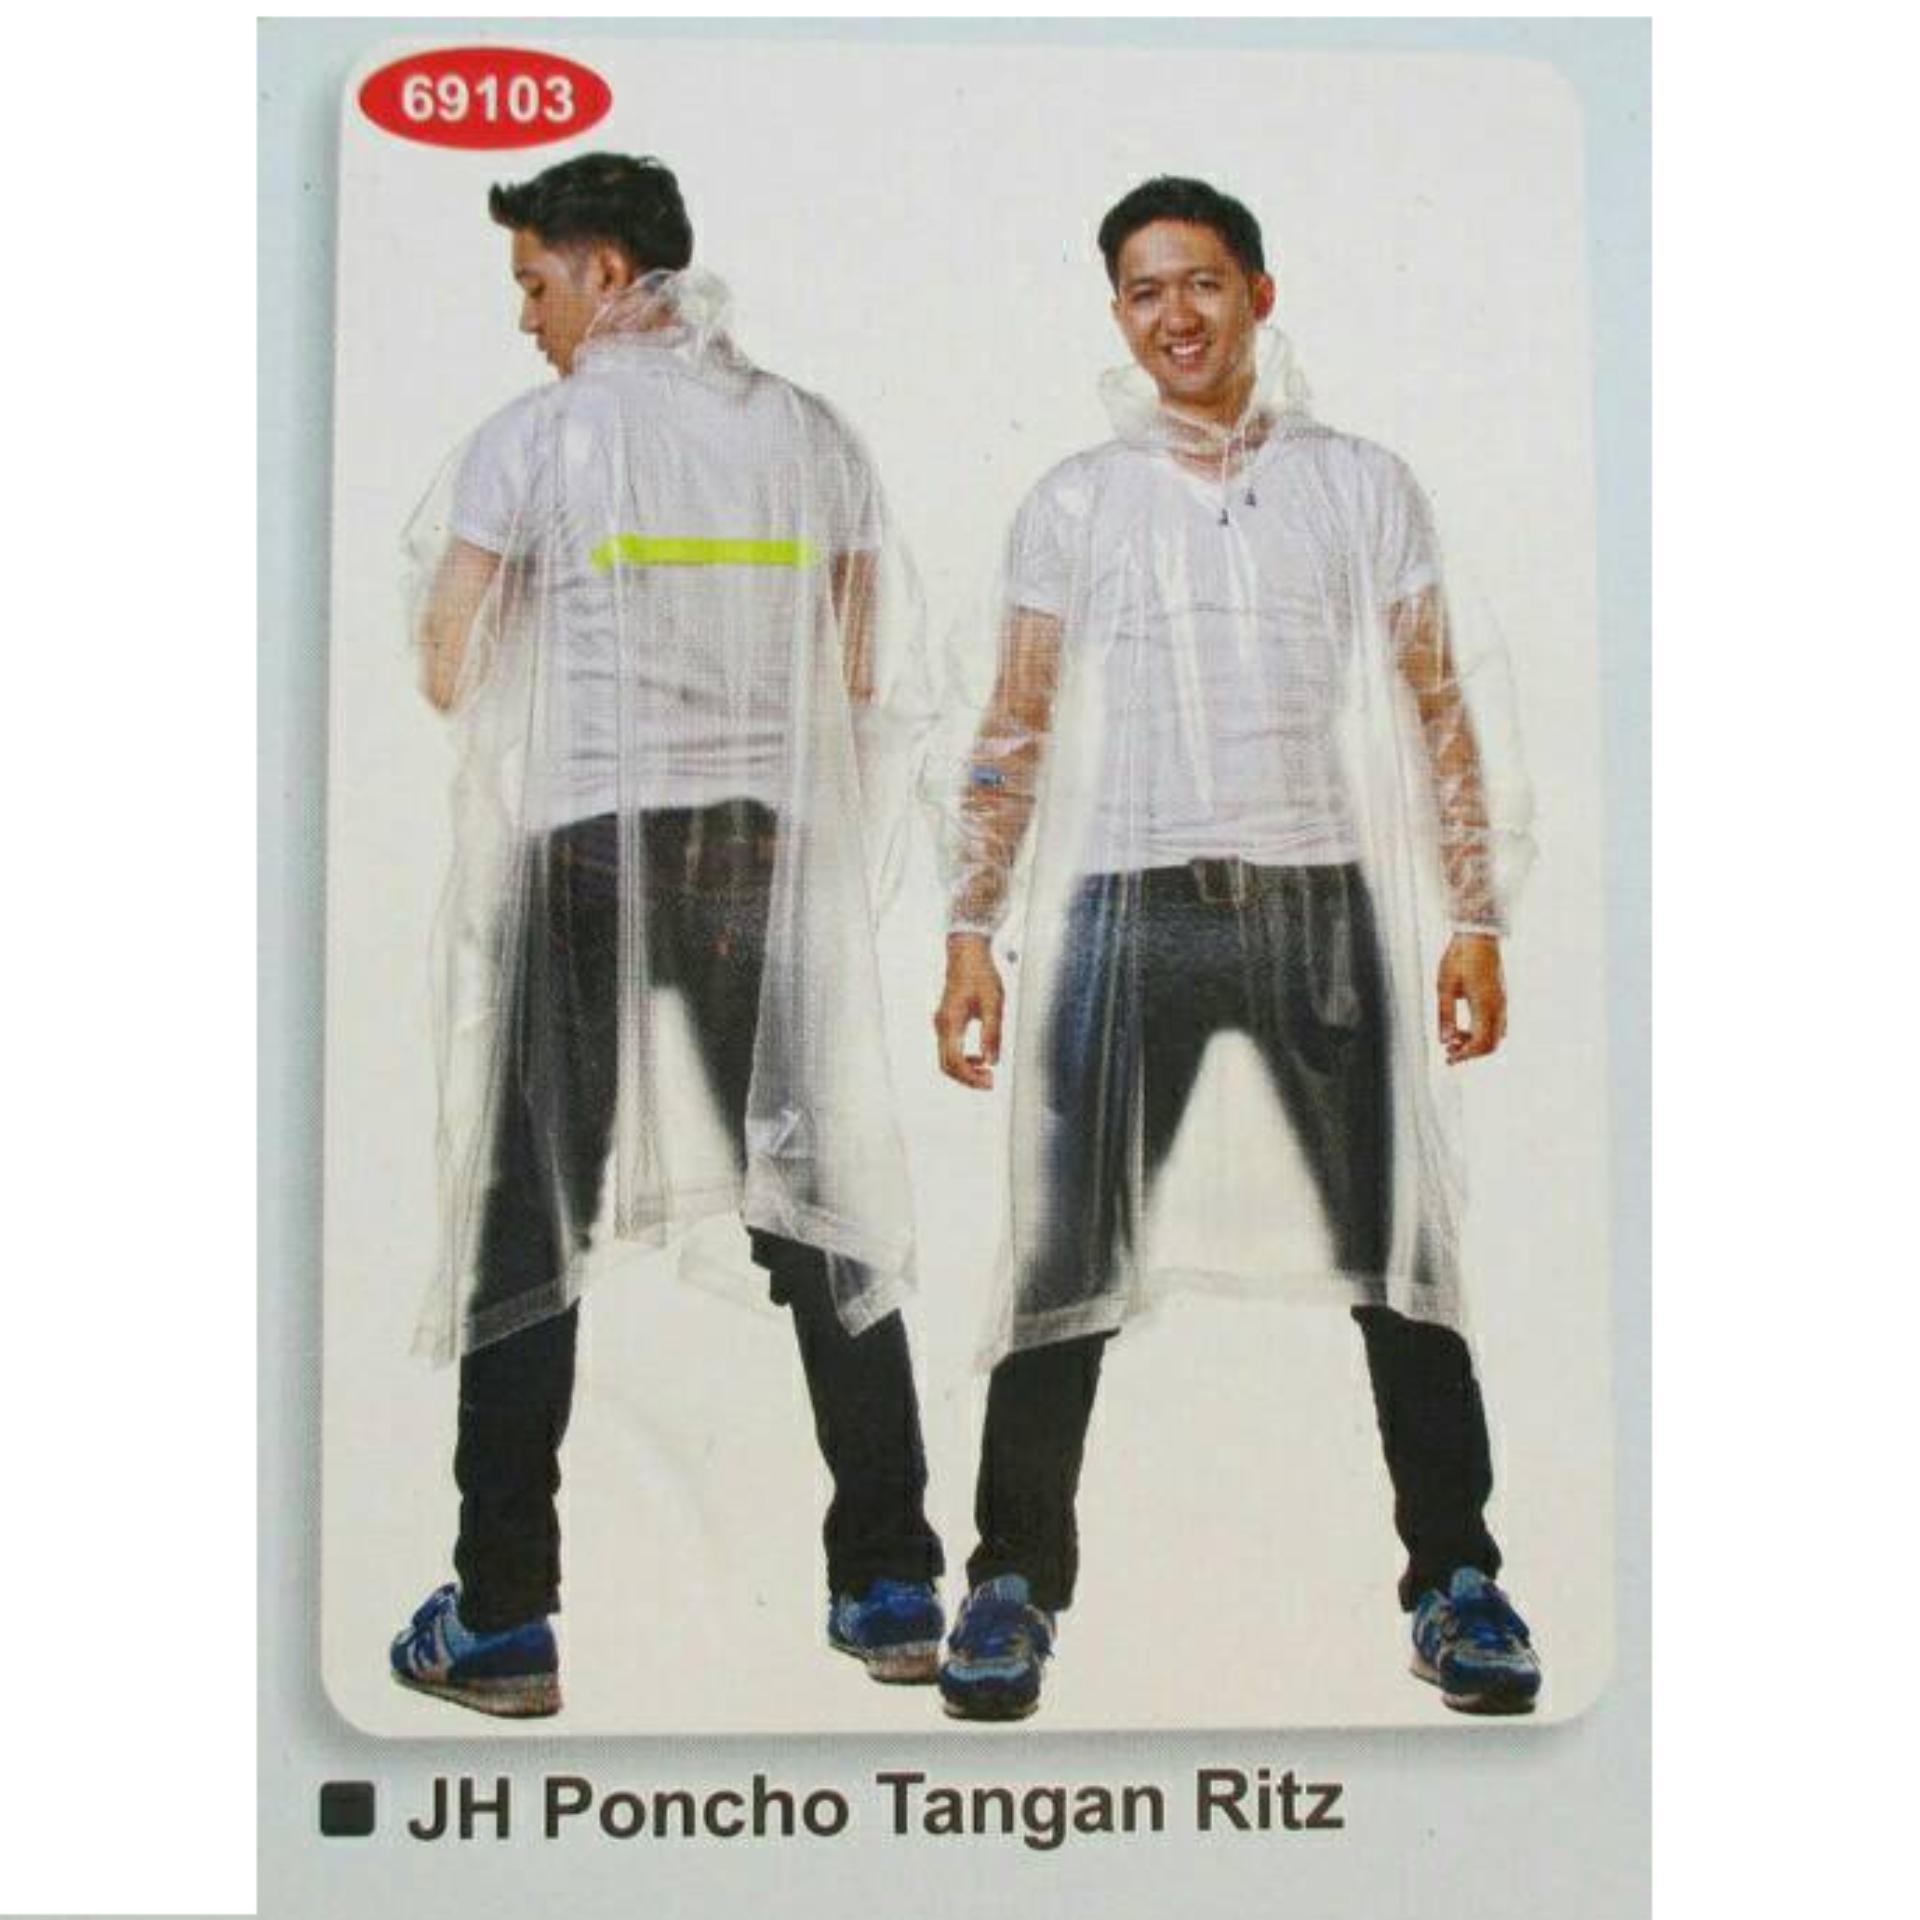 Hijau Jas Hujan Plevia Jaket Baju Celana Pop Setelan Stelan Pria Sigma Muda Merah Raincity 69103 Transparan Ponco Bajutransparant Poncho